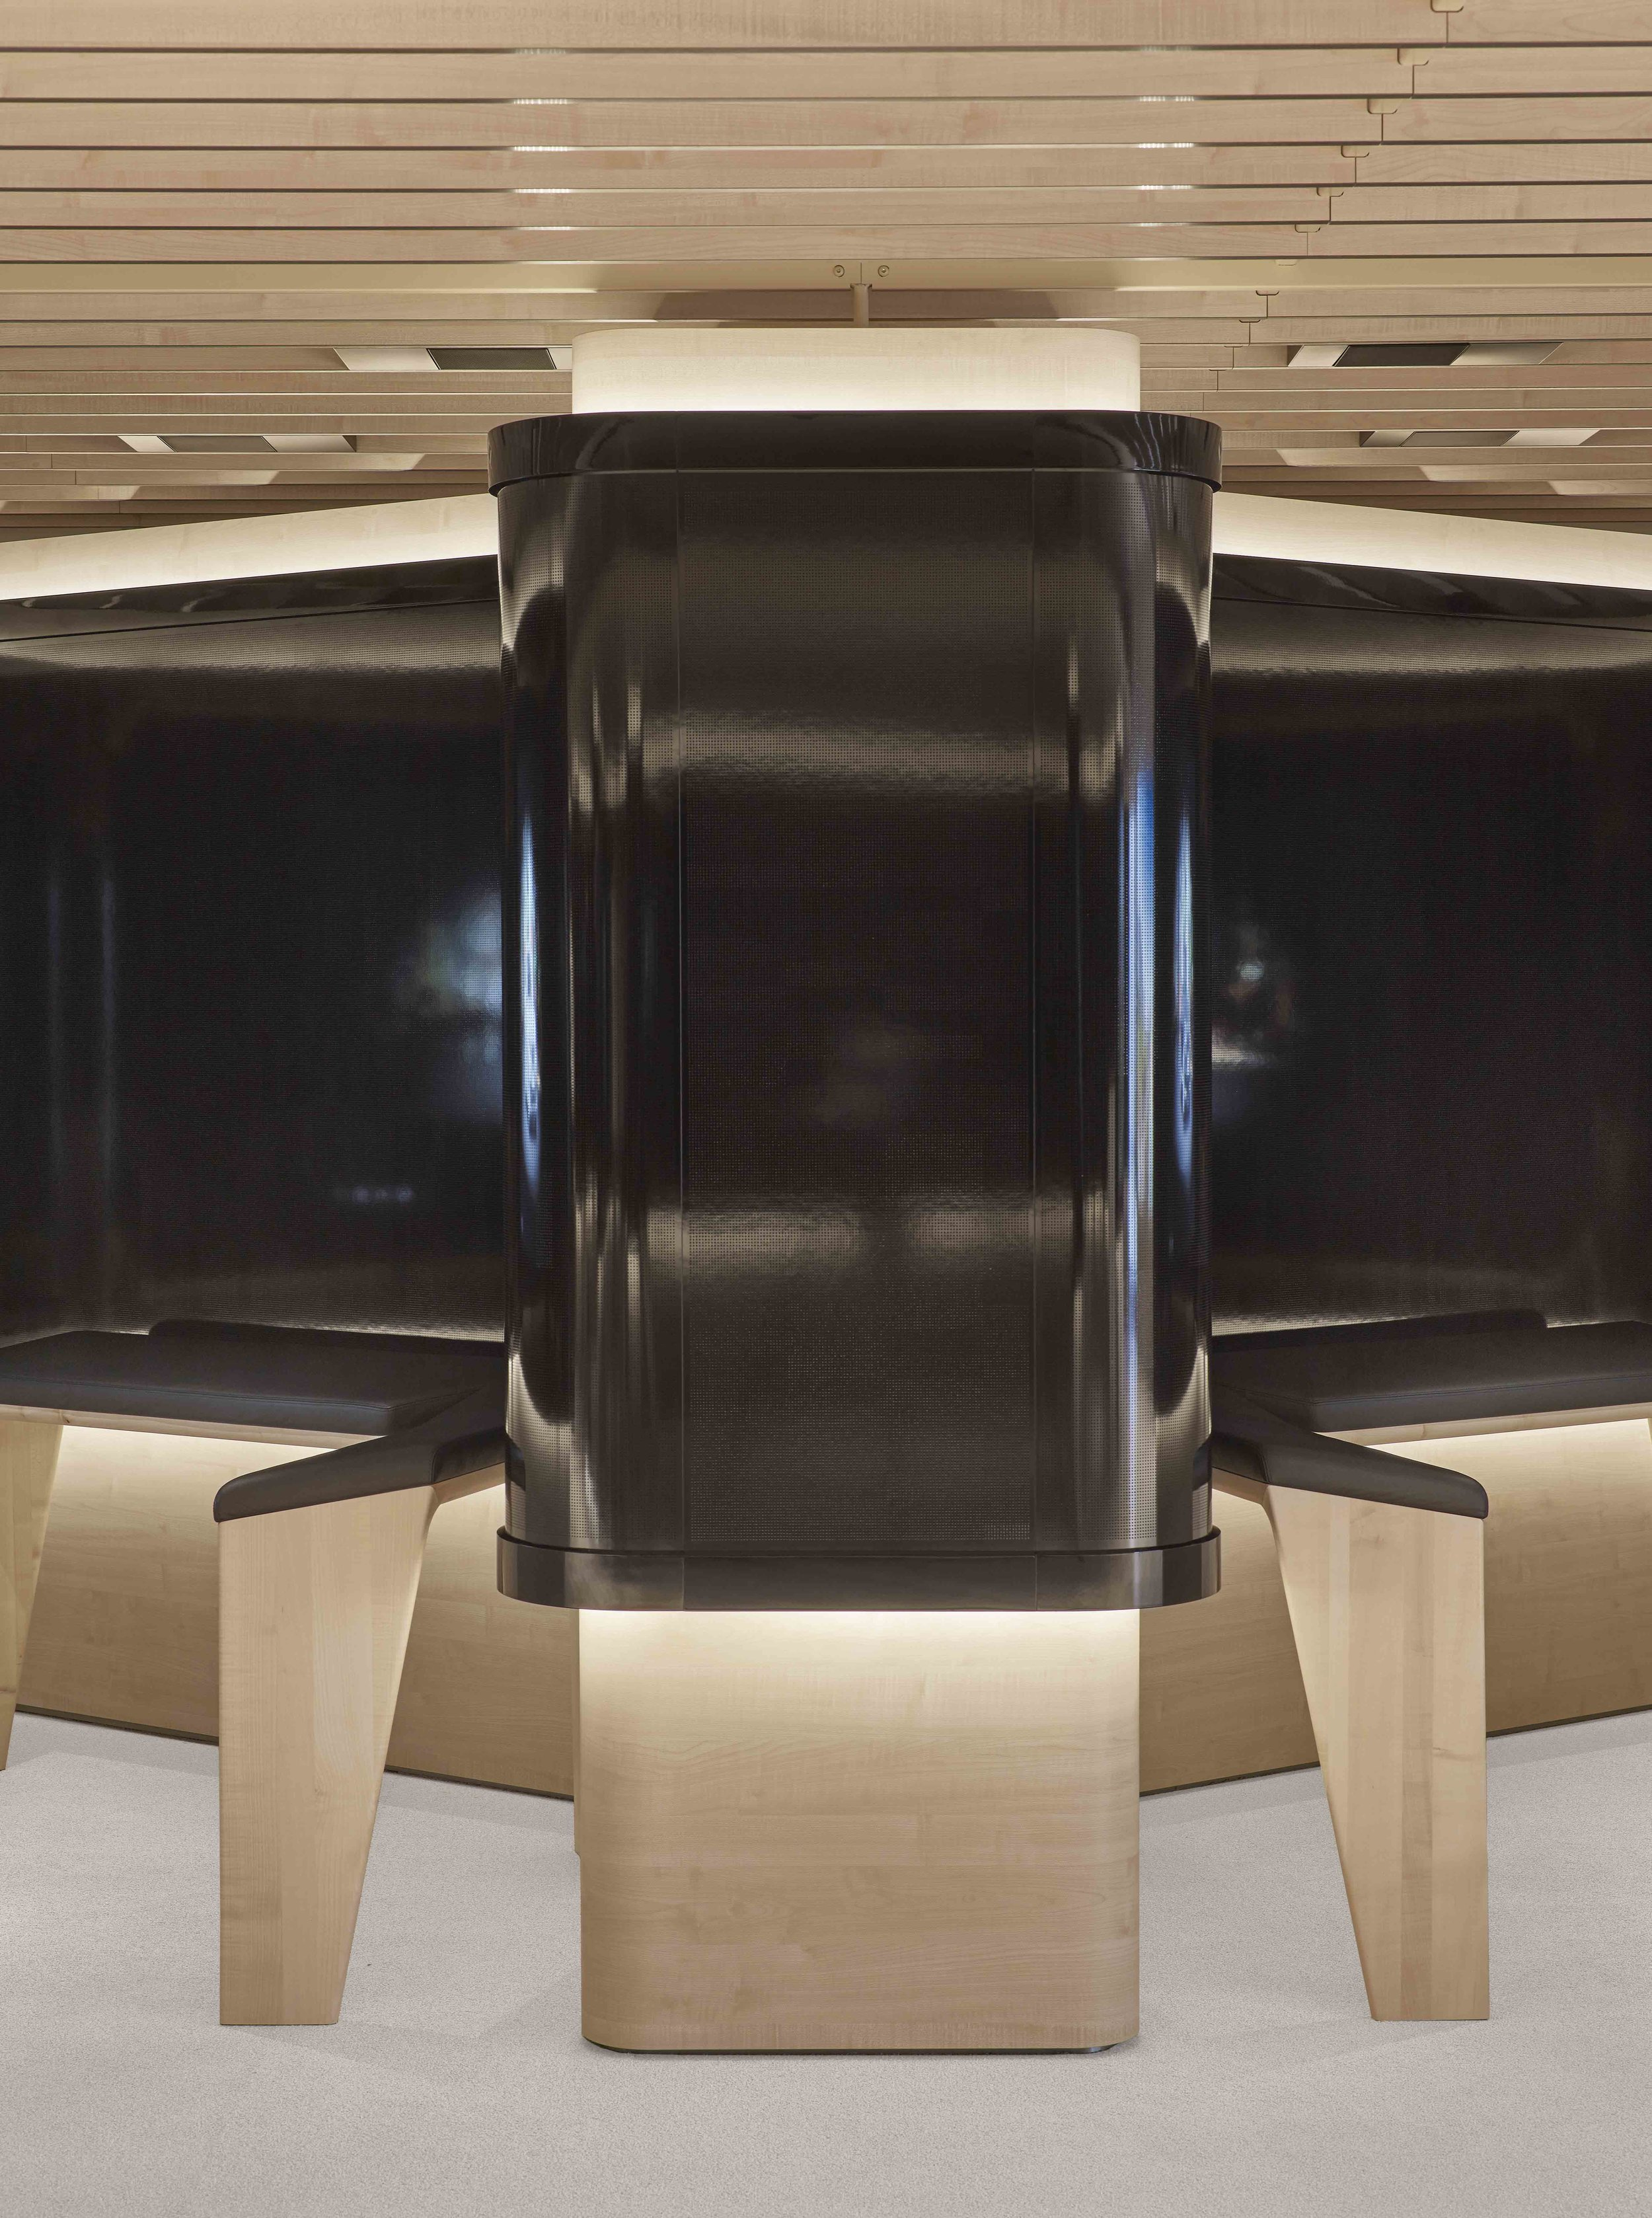 bmw-product-information-center_coorporate-interior-design_coordination-berlin_11.jpg